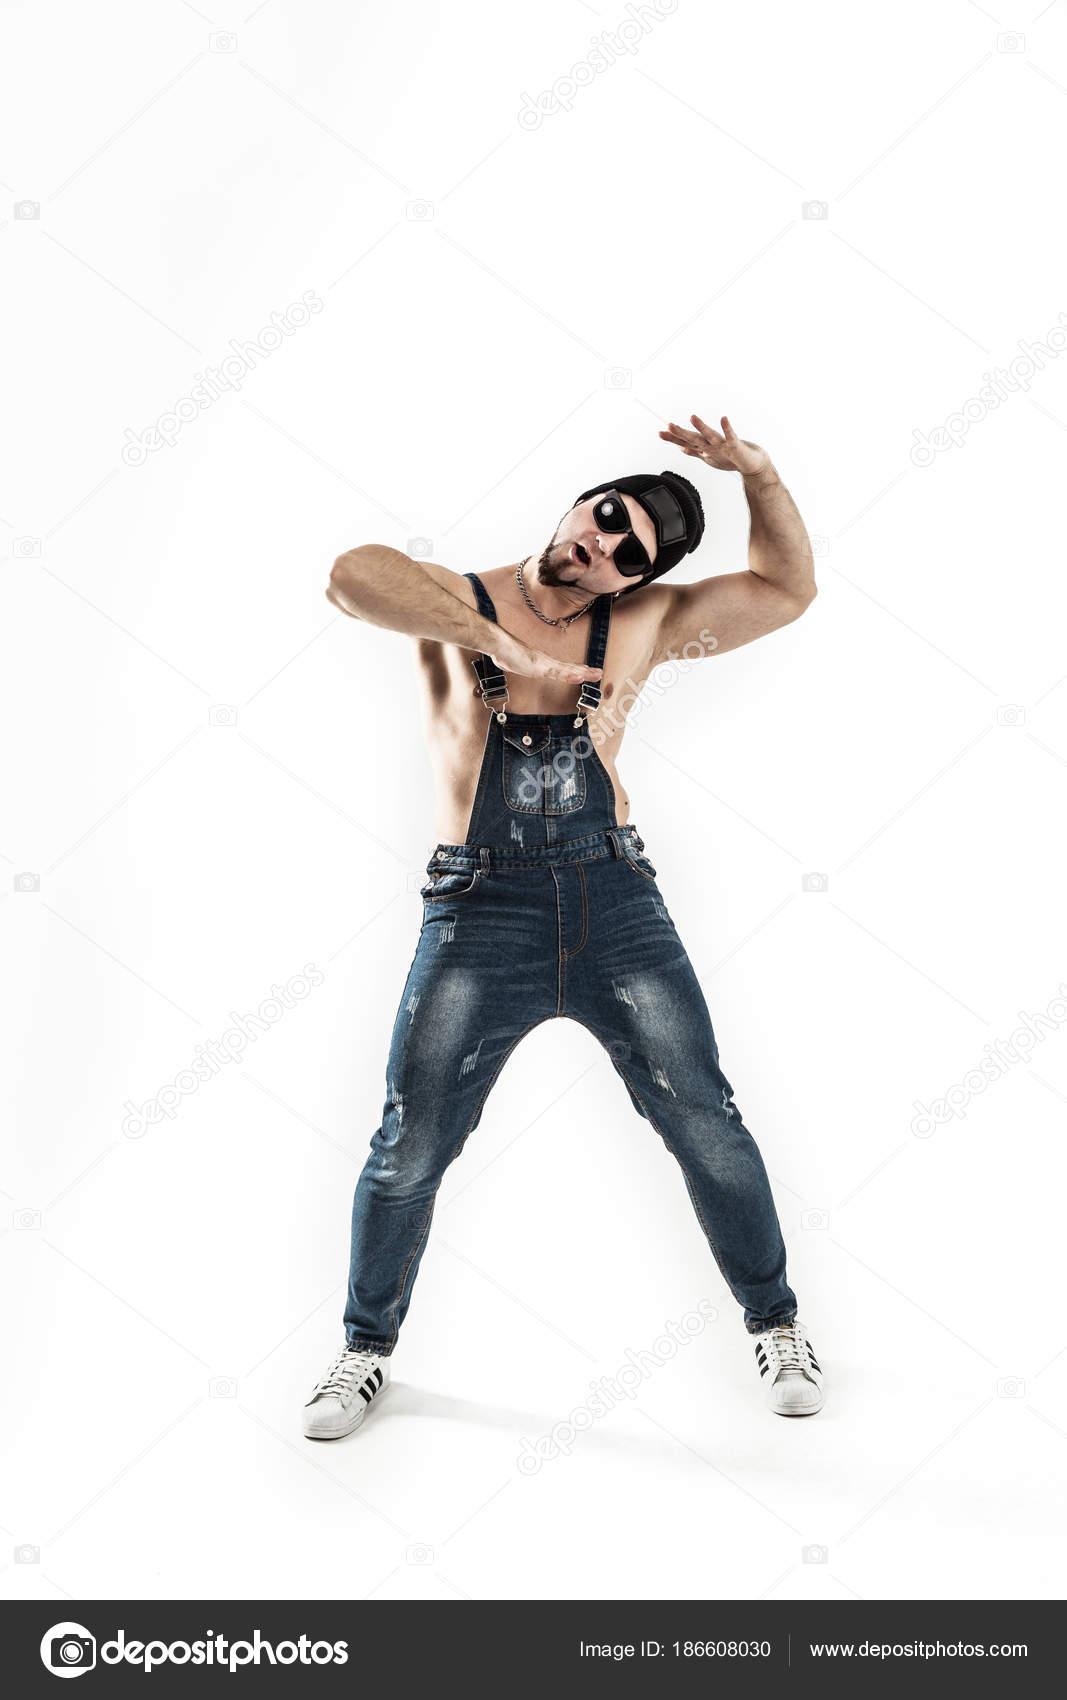 Mejor rapero bailando break dance .photo sobre un fondo claro — Foto de  Stock b9a52513eca